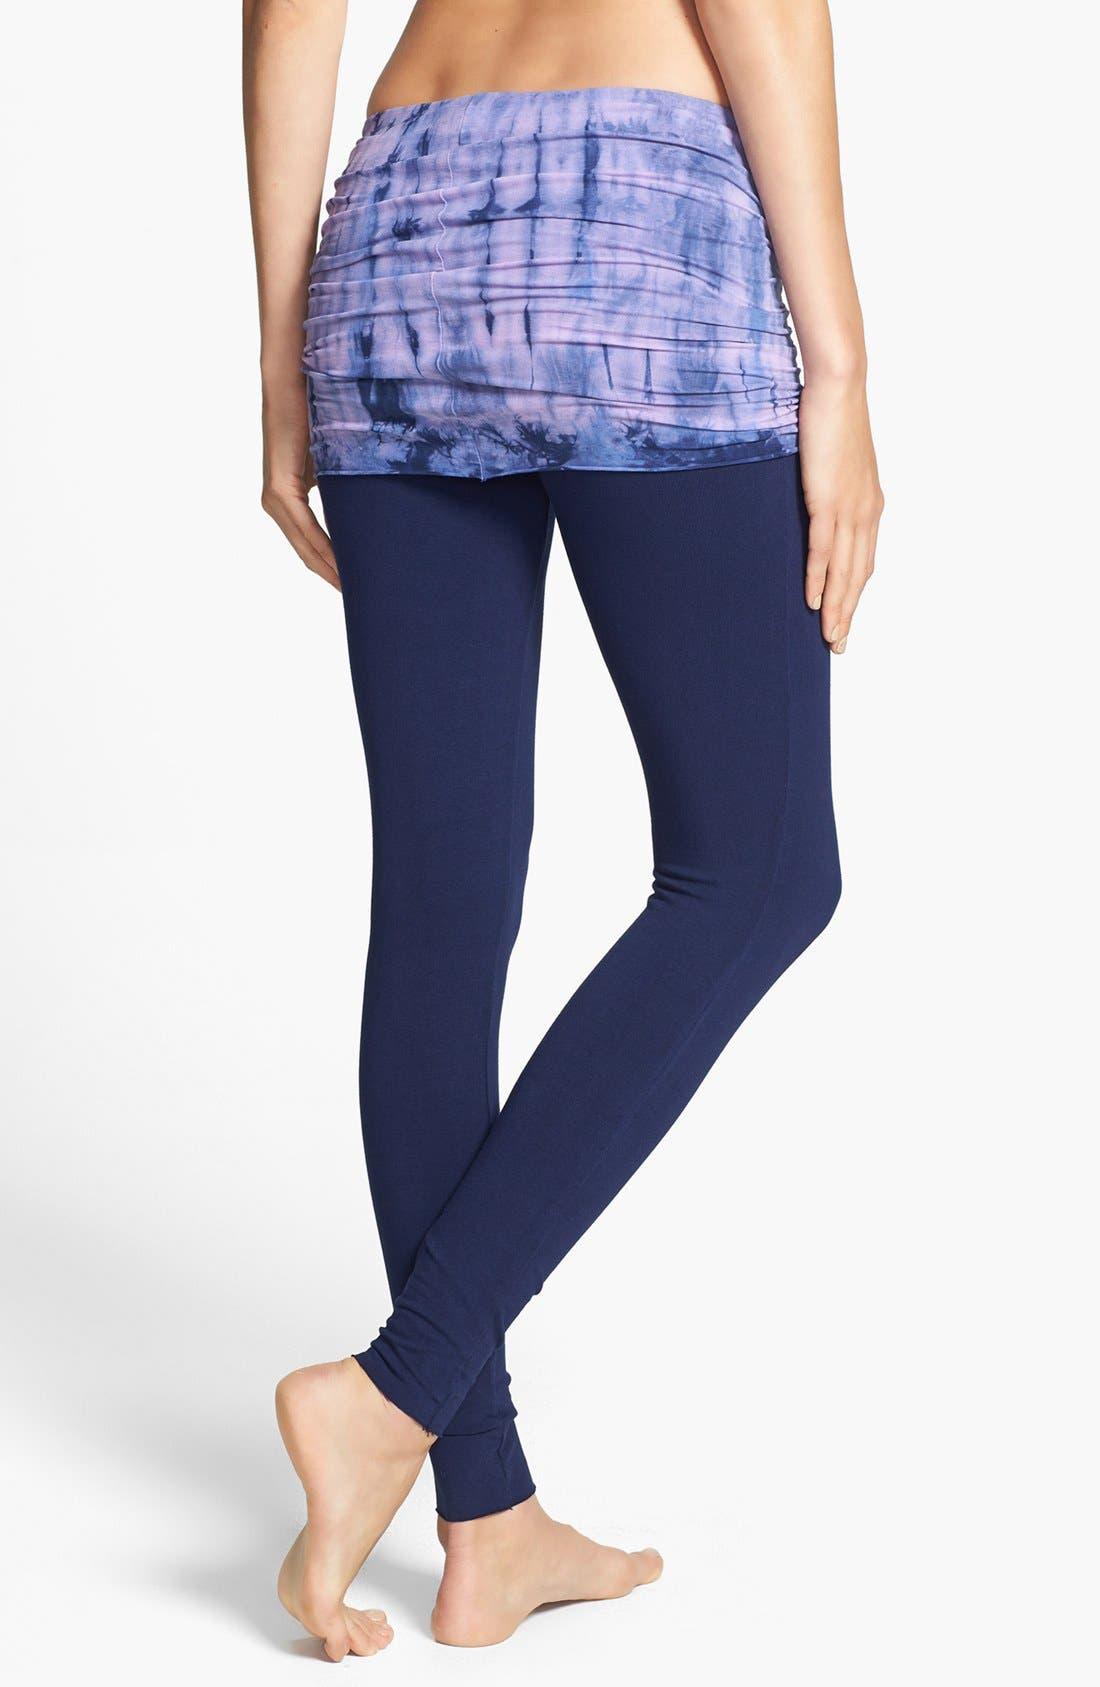 Alternate Image 2  - Omgirl 'Nomad - Mad Plaid' Organic Cotton Foldover Leggings